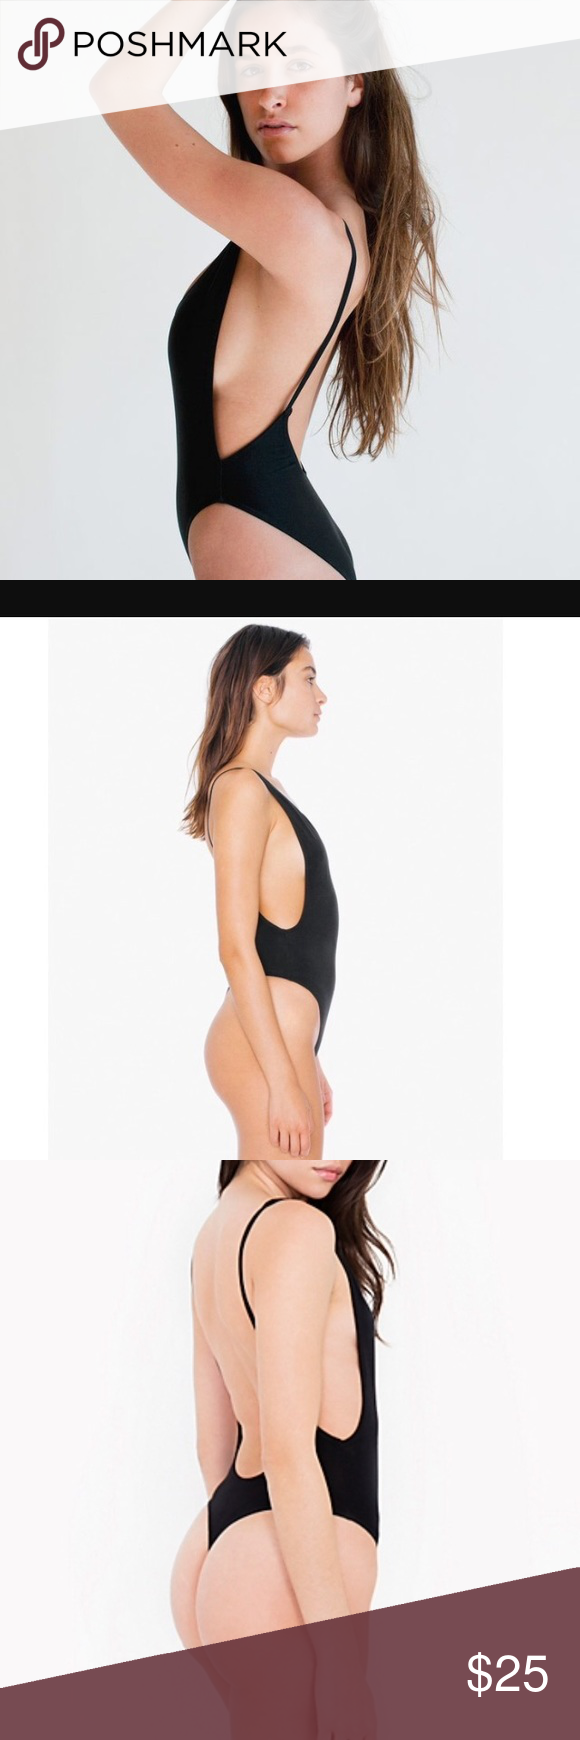 American Apparel black deep cut low back bodysuit Size S ee4b53e81